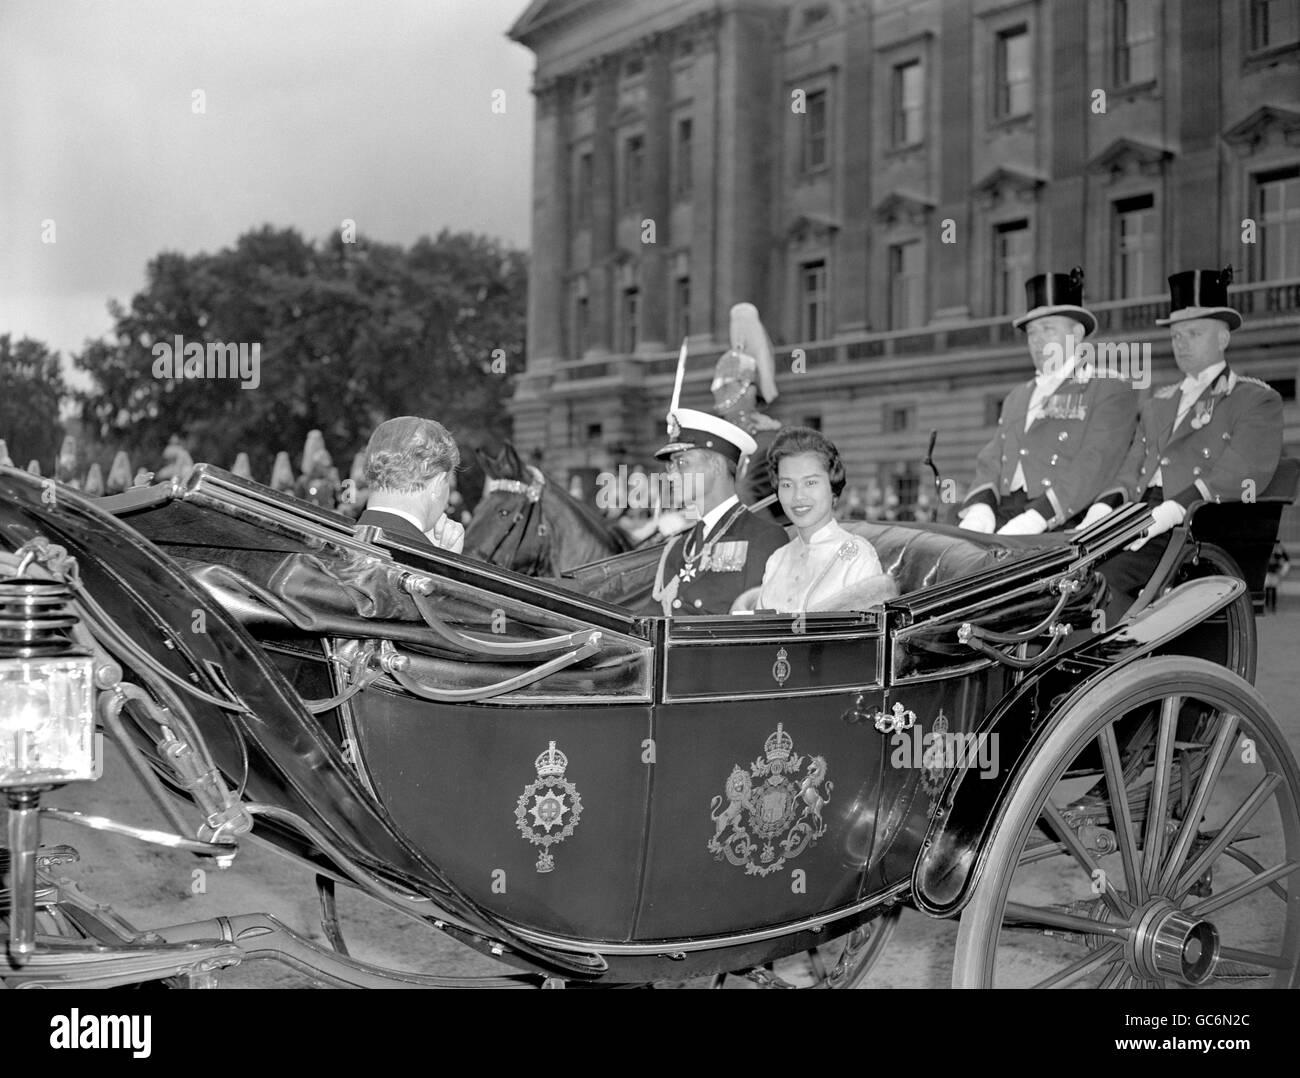 Royalty - King Bhumibol Adulyadej of Thailand State Visit - London - Stock Image